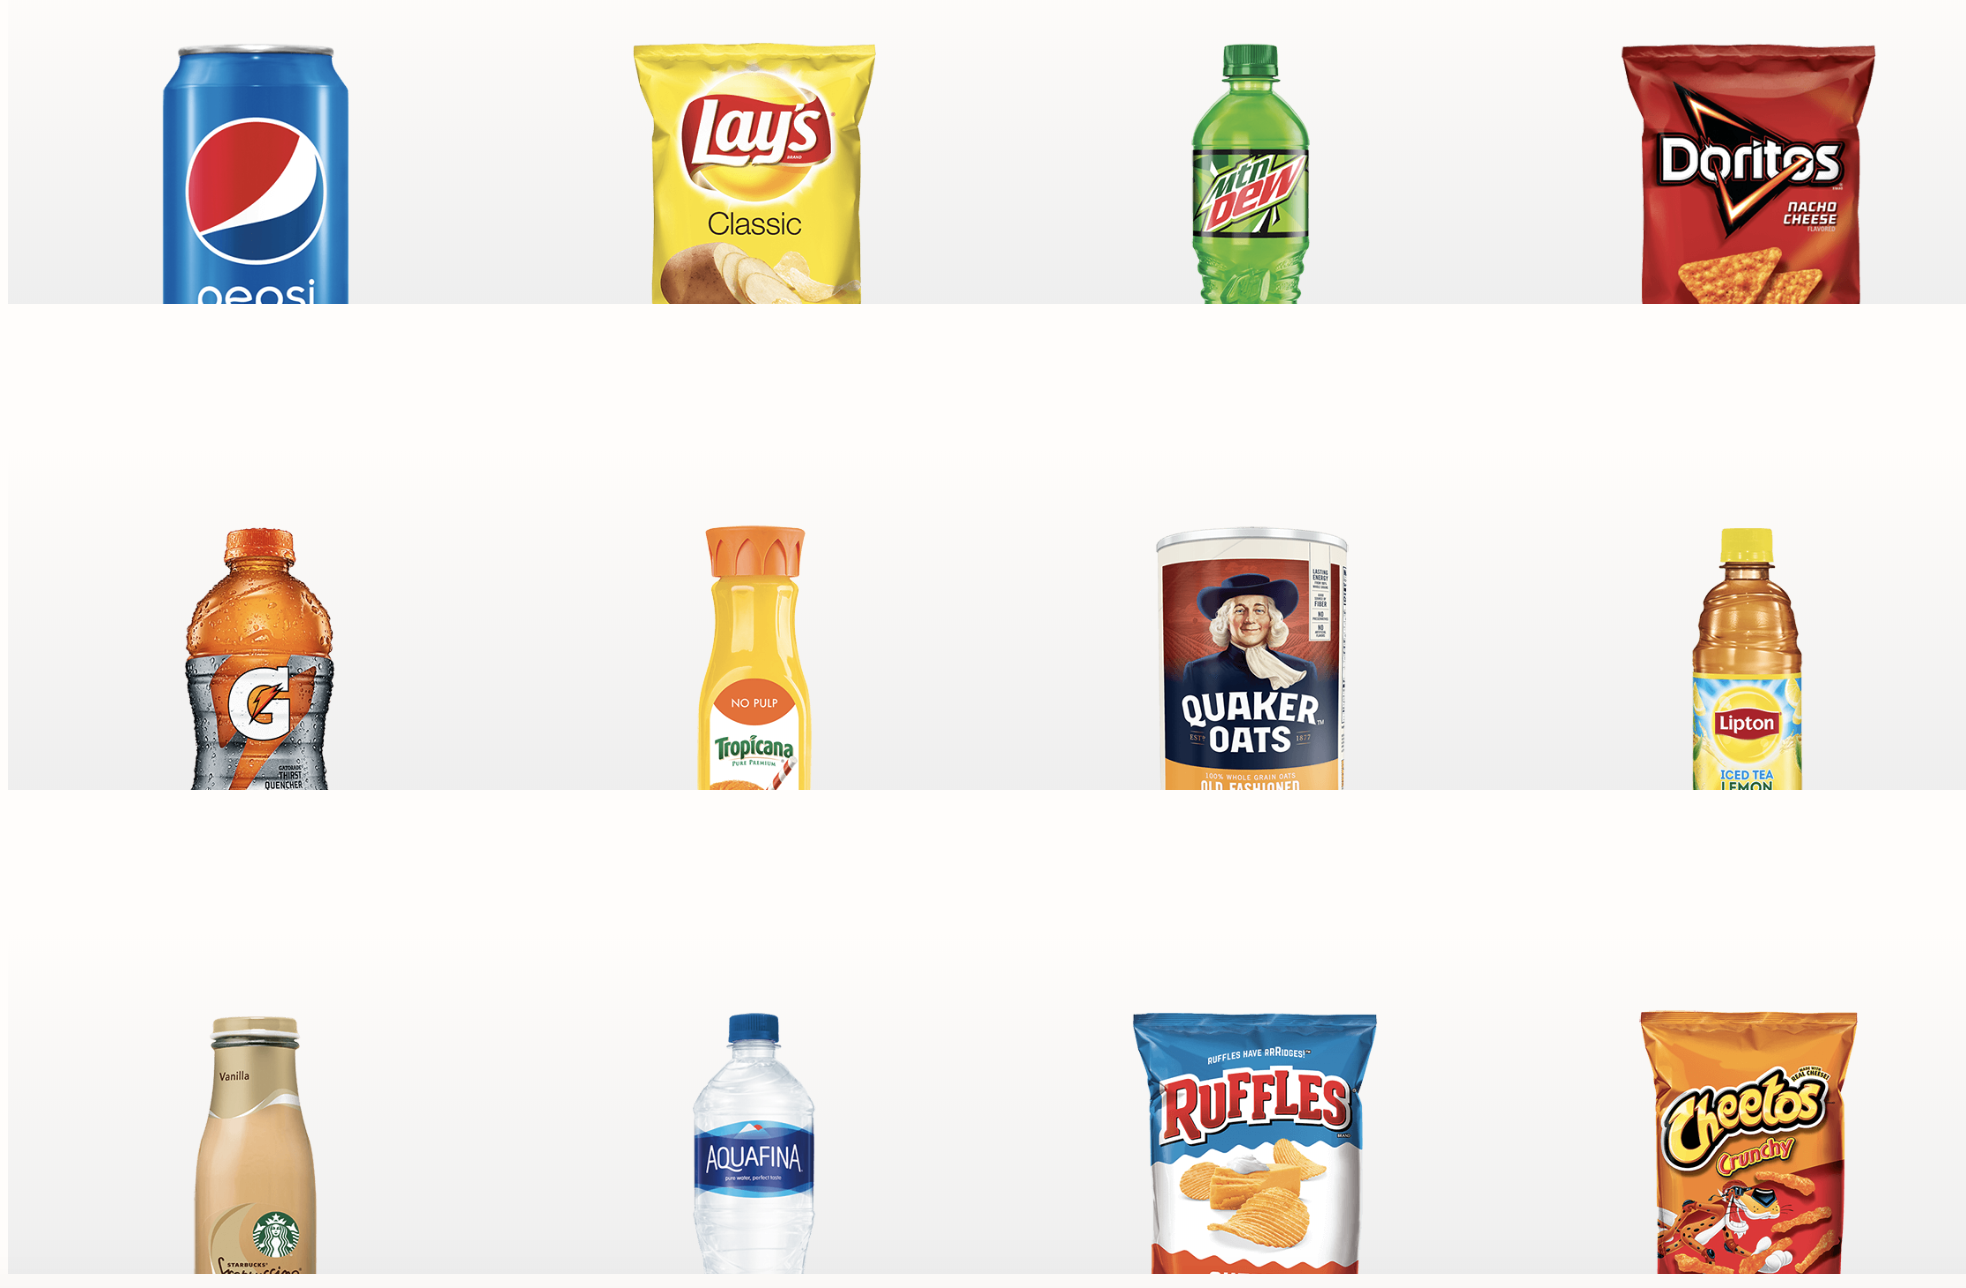 JD.com Lands Strategic Partnership With Global Giant PepsiCo